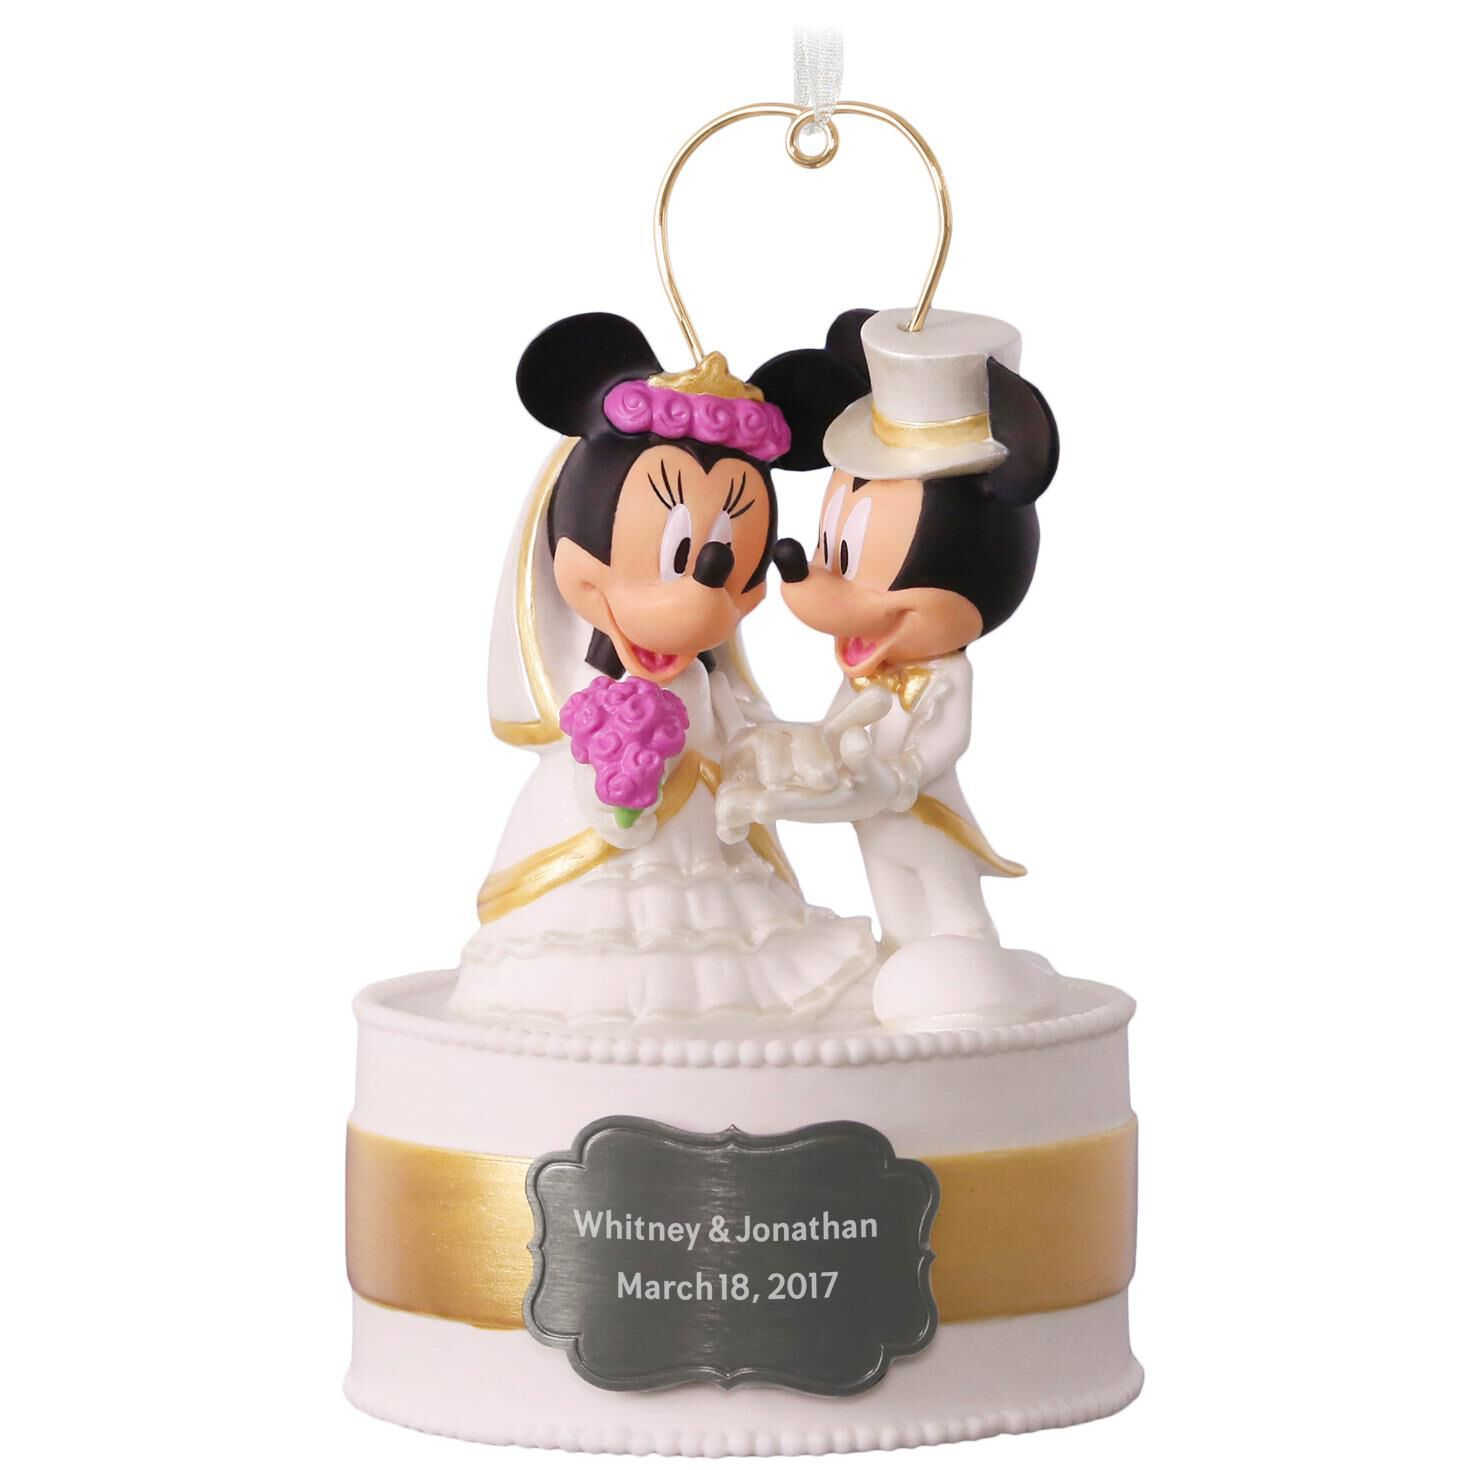 Disney Mickey and Minnie Personalized Wedding Cake Ornament ...